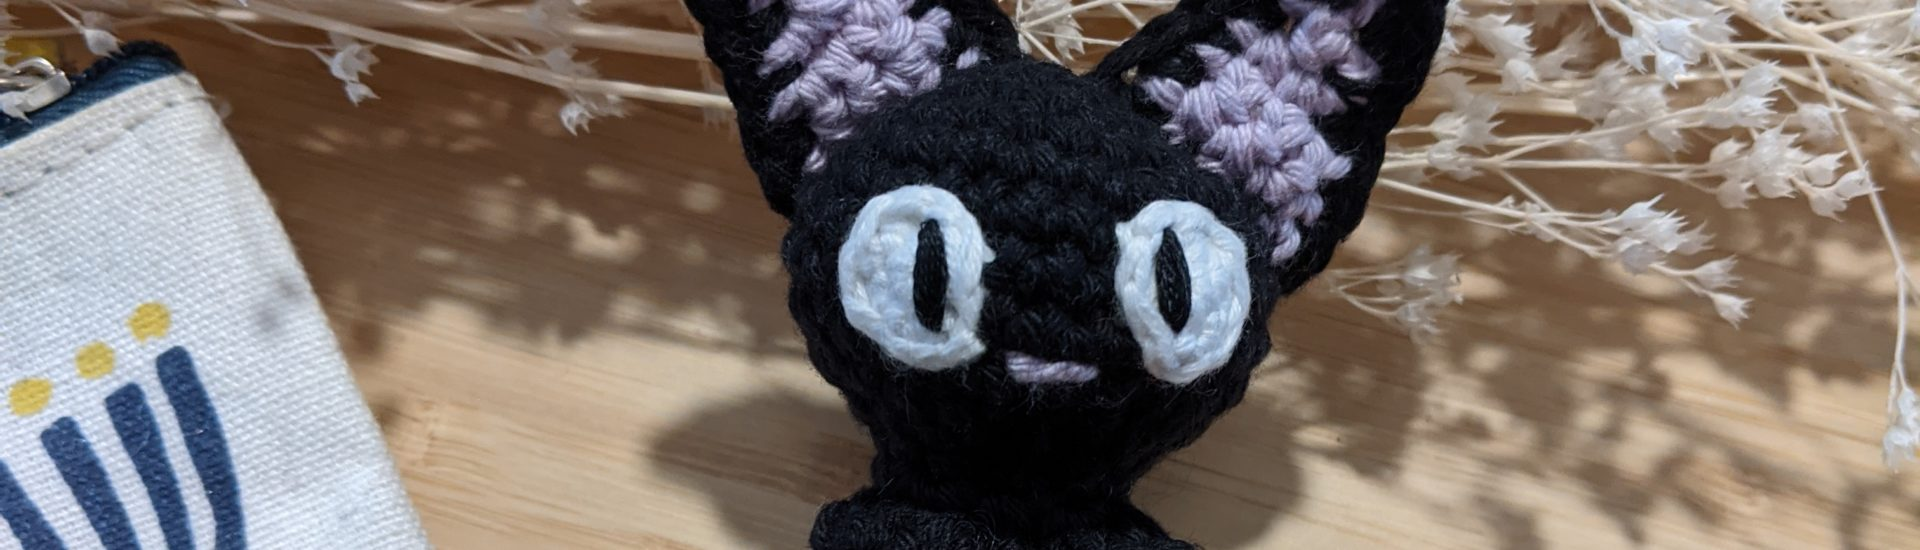 Jiji the cat crochet pattern